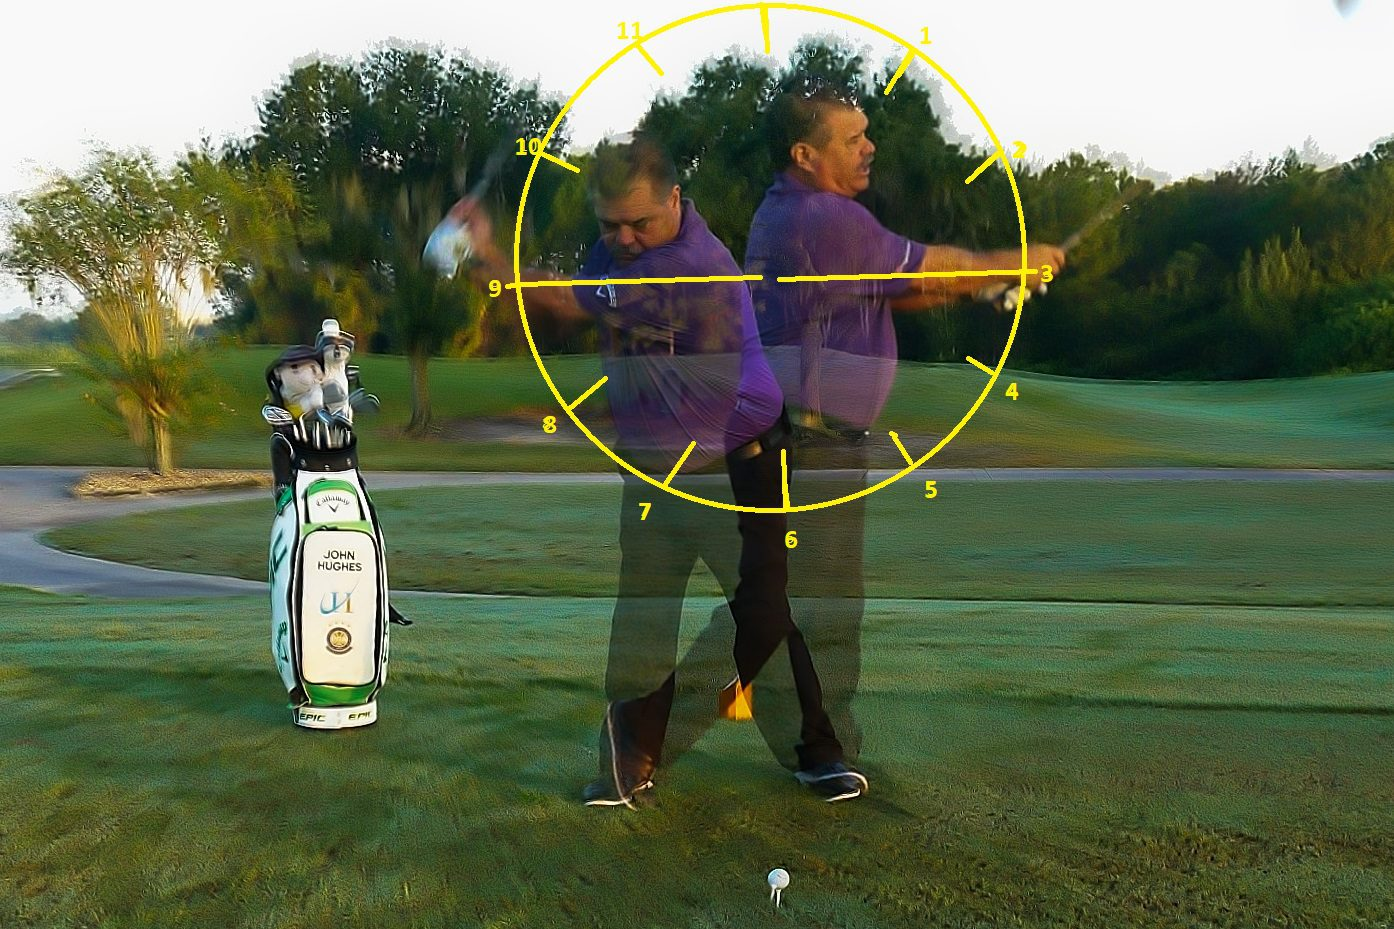 9 to 3 Drill, Impact Position, John Hughes Golf, Golf Schools in Florida, Florida Golf Schools, Orlando Golf Schools, Golf Schools in Orlando